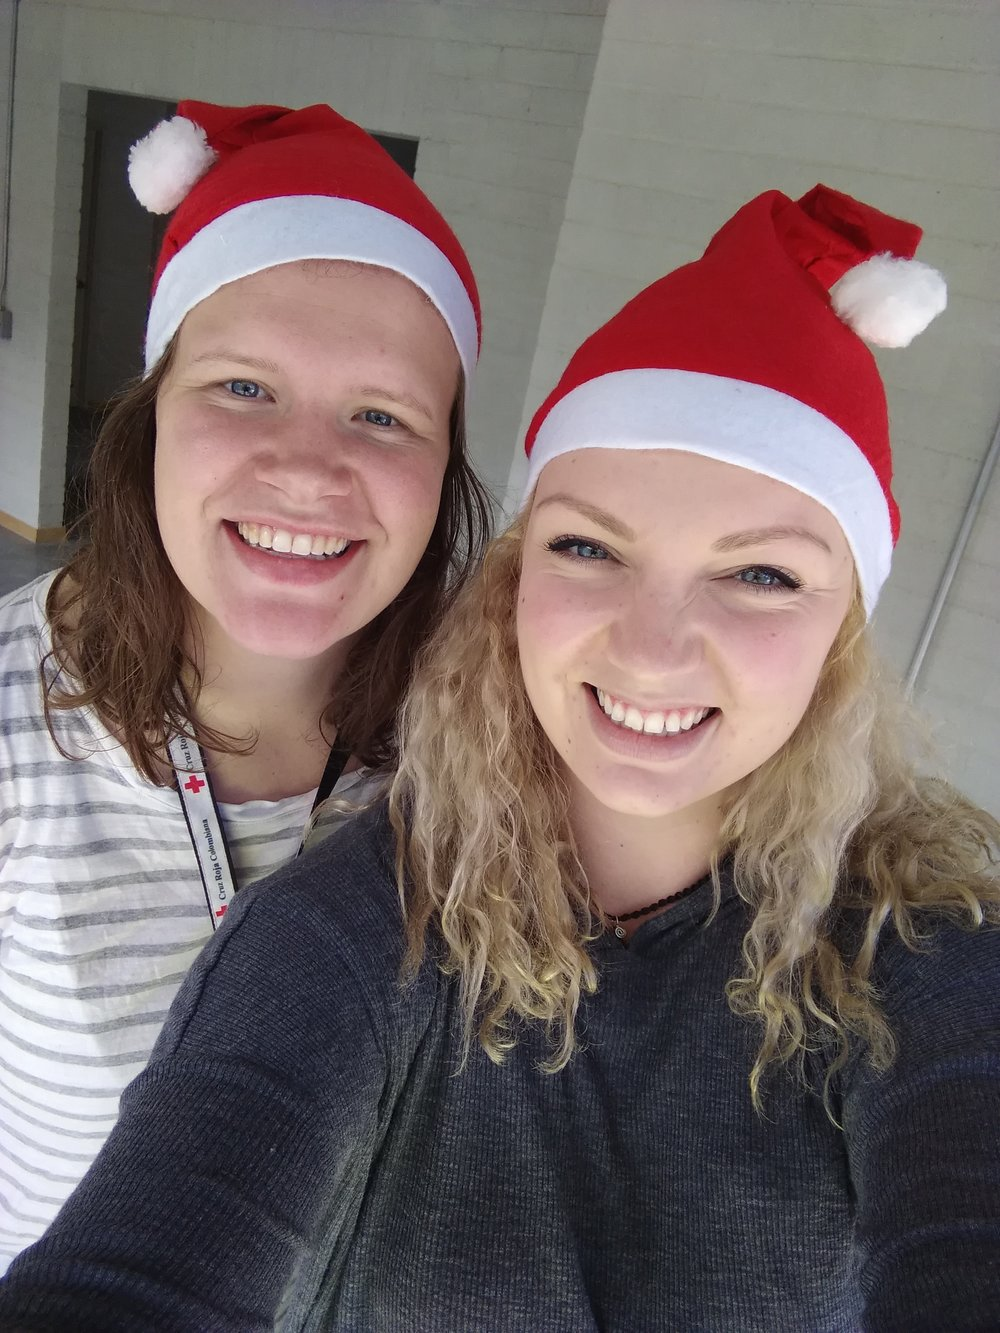 Christmas selfie, Kristine Nordås Toska and Sofie Sundström Bele.  Selfie by: Sofie S. Bele